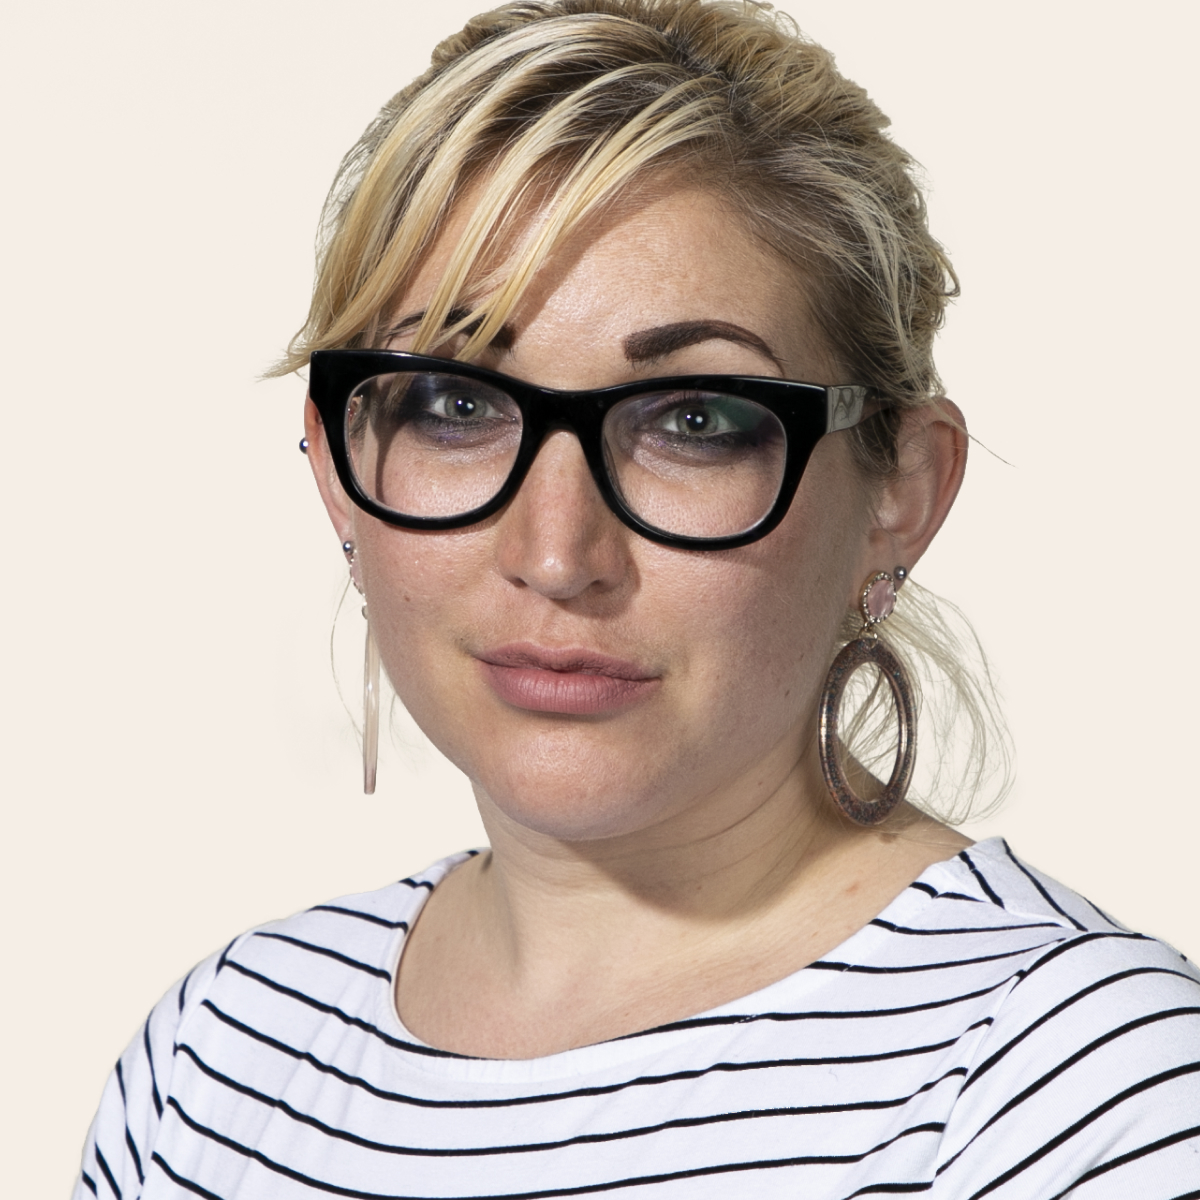 Headshot photo of Vivienne Pustell